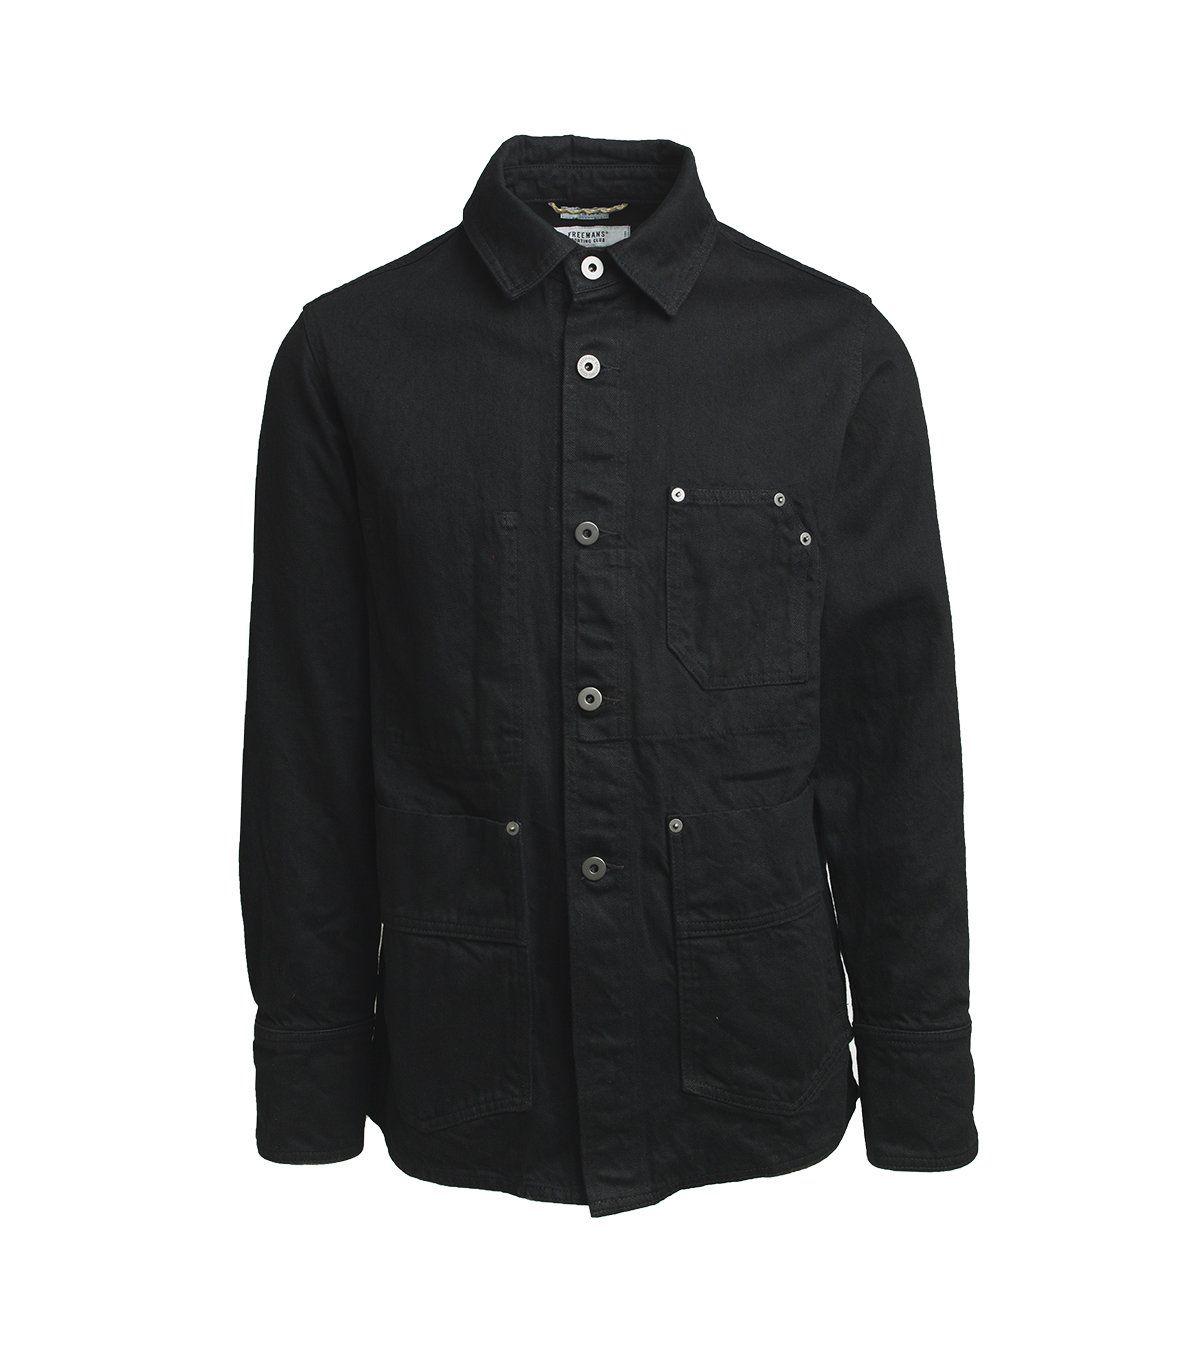 Freemans Sporting Club — Chore Jacket Black Denim Jackets